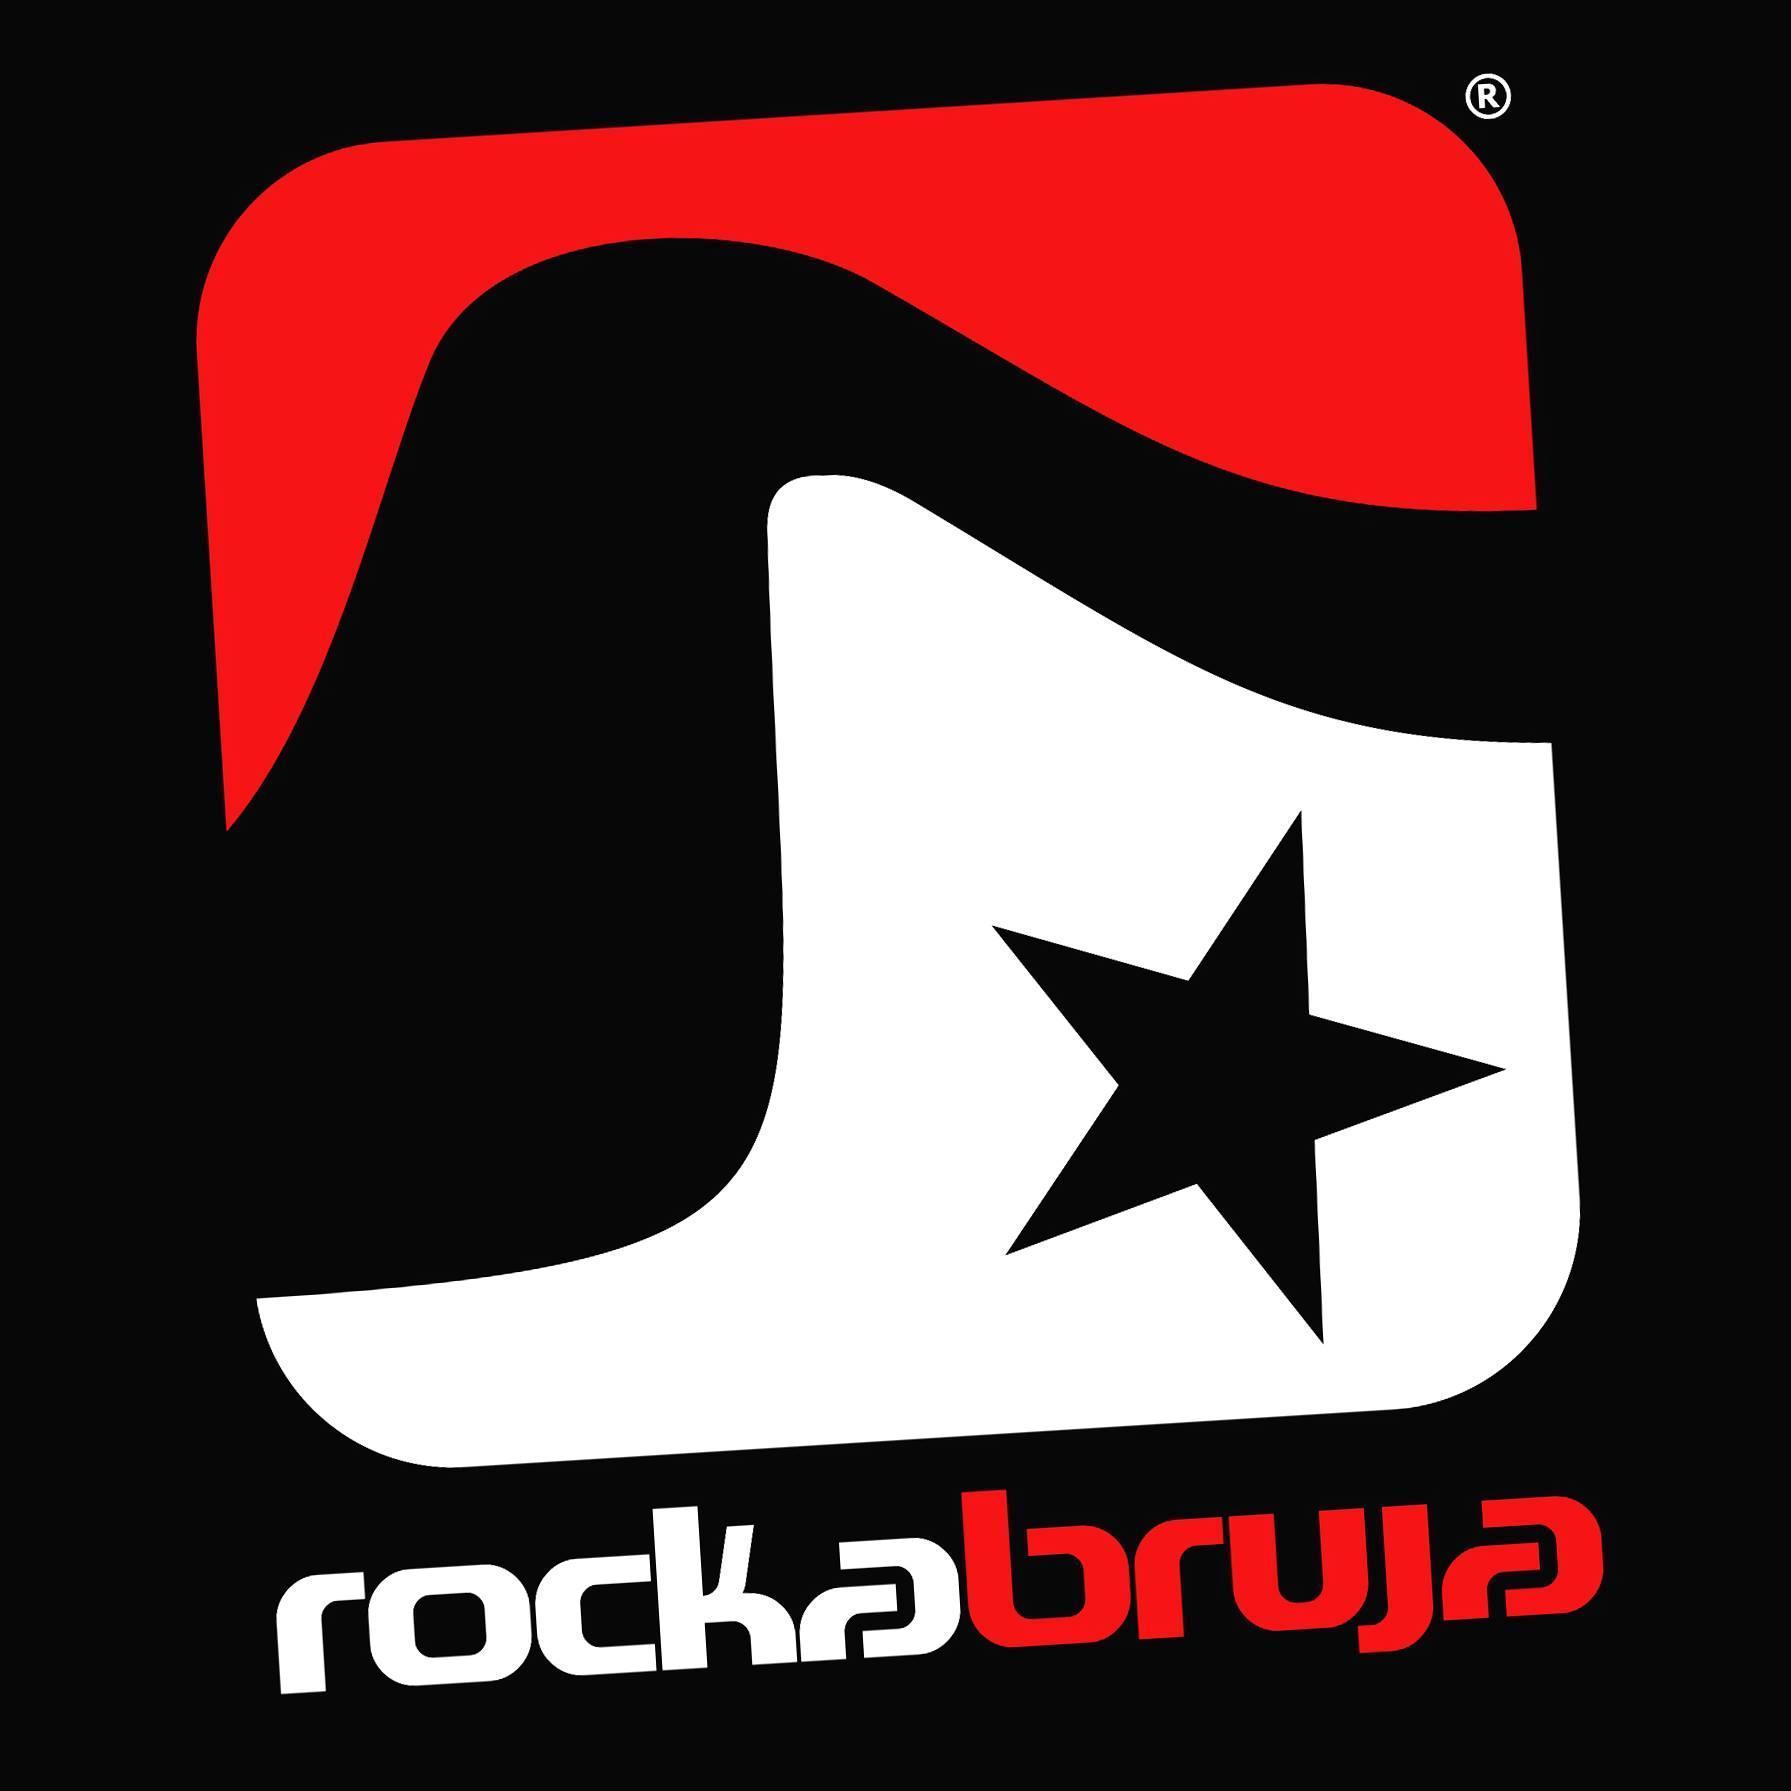 Rocka Bruja